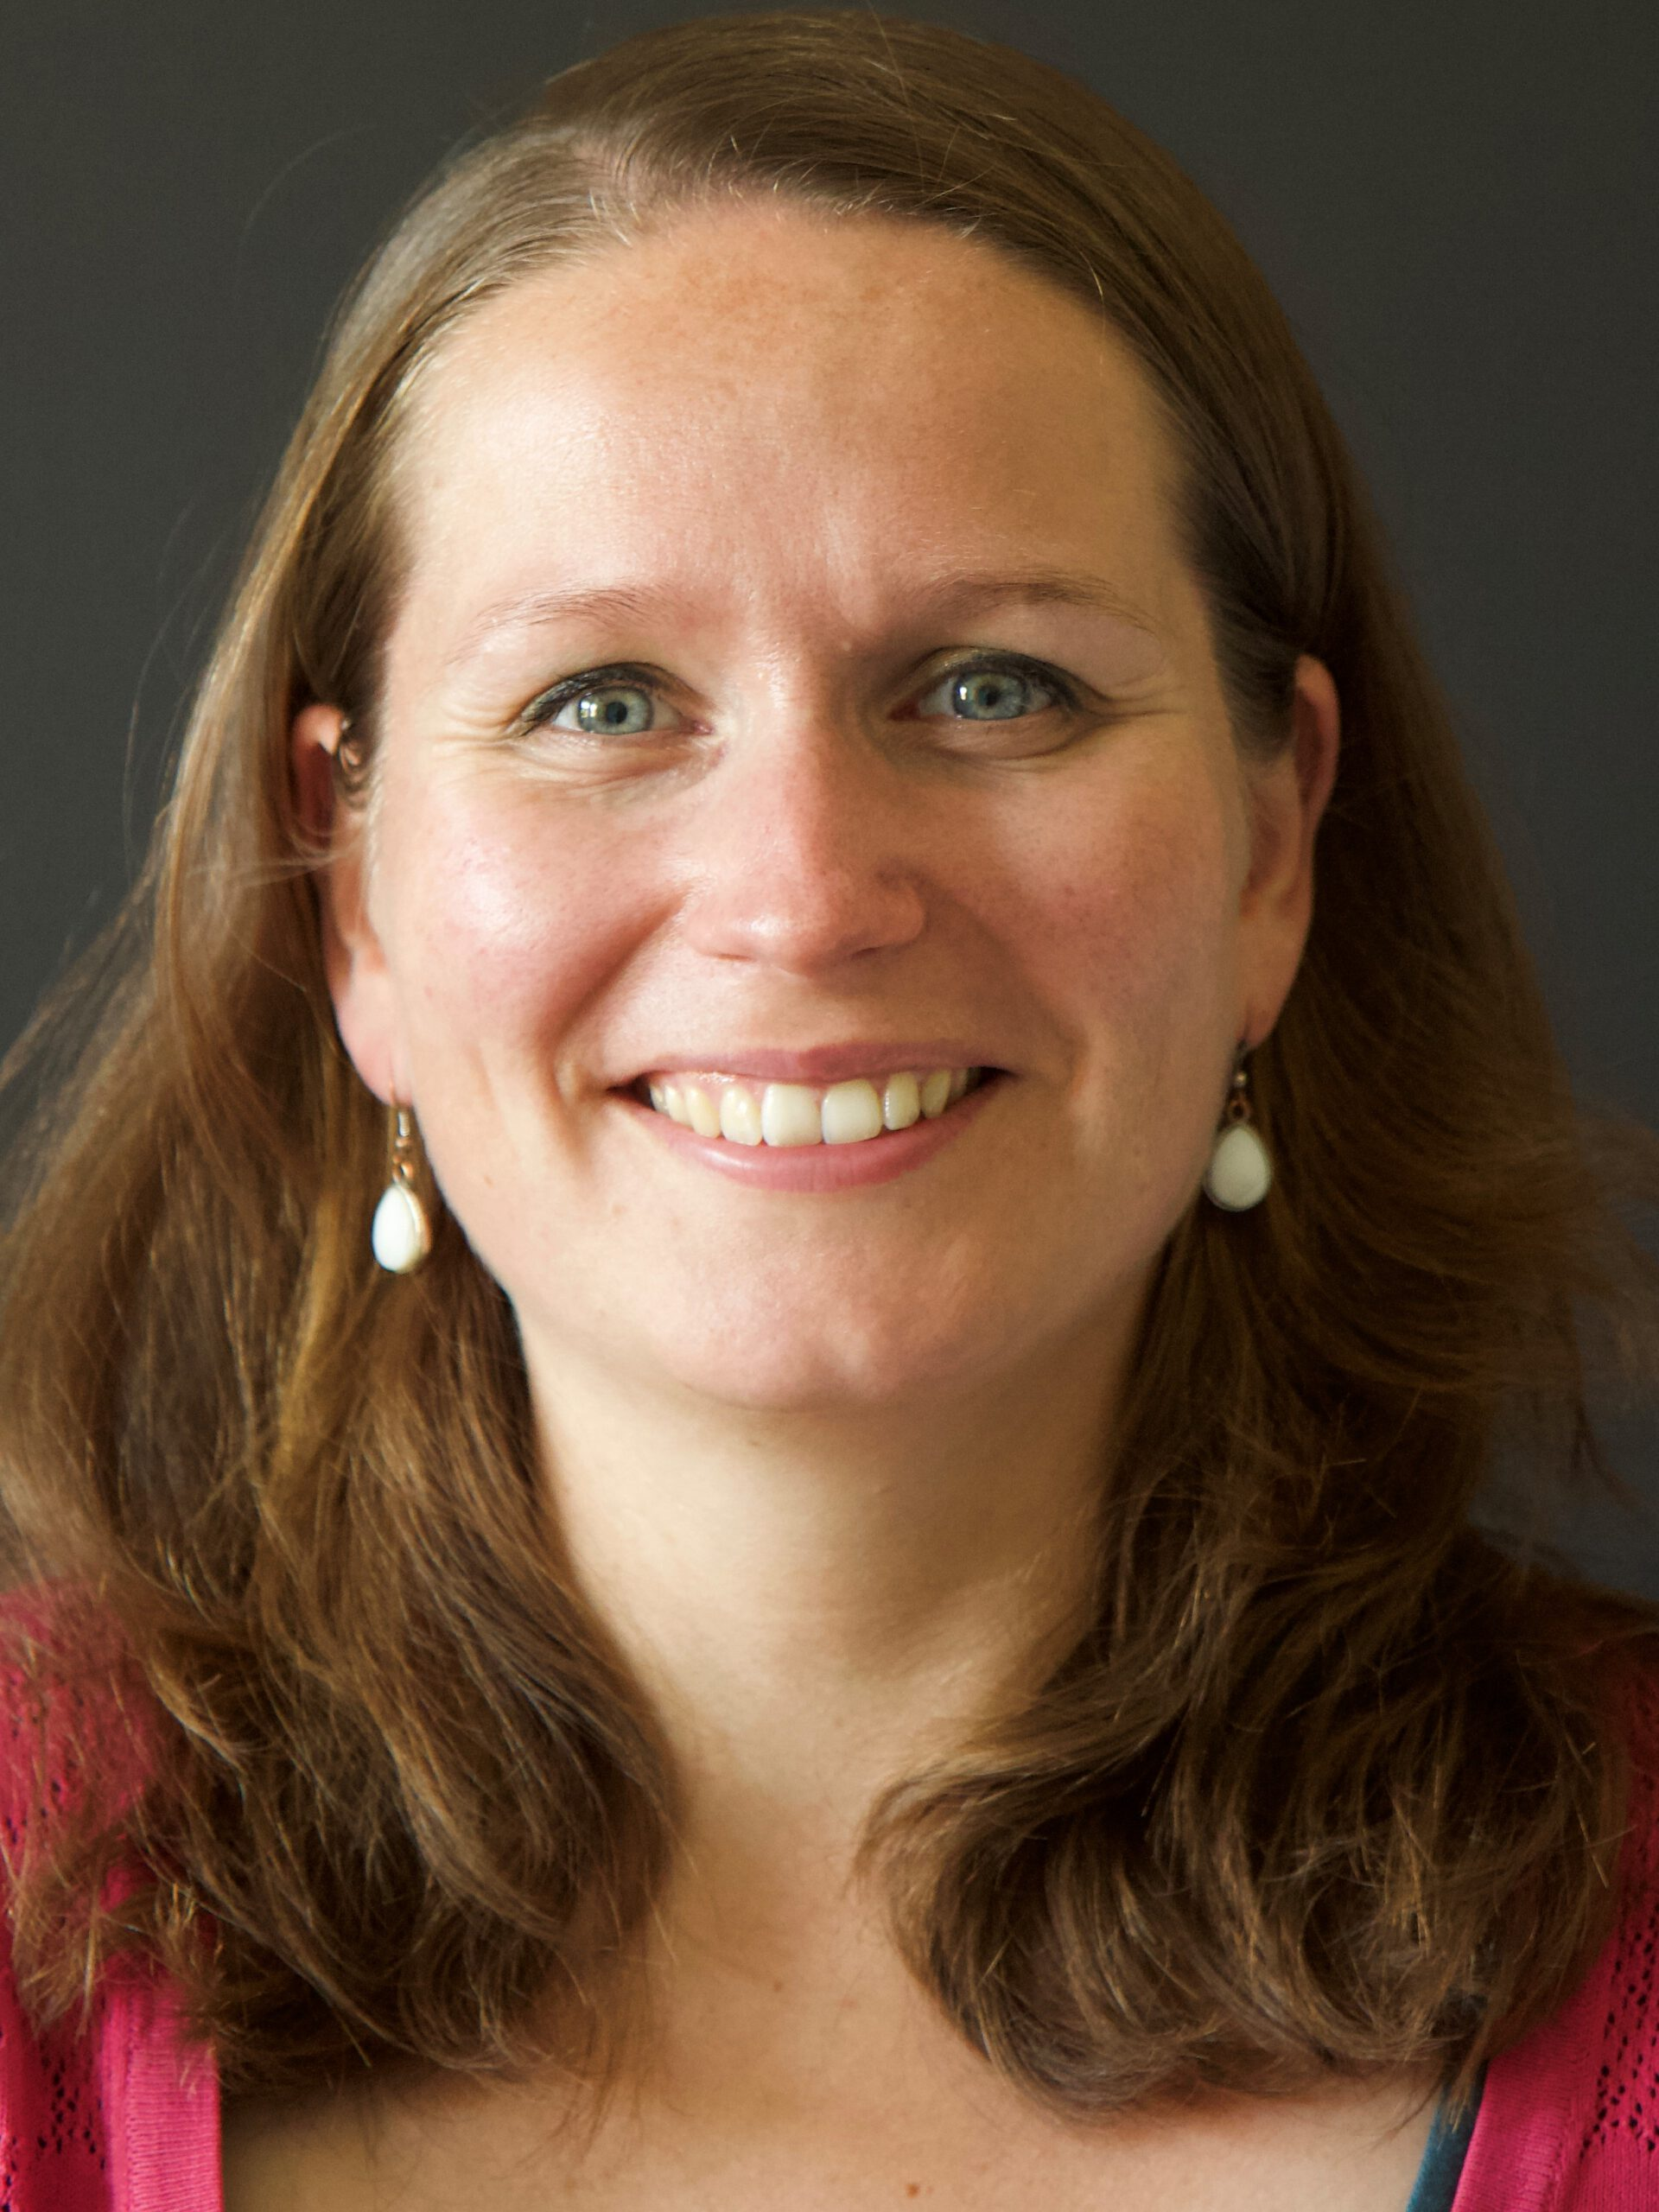 Lionne Venderbos, PhD